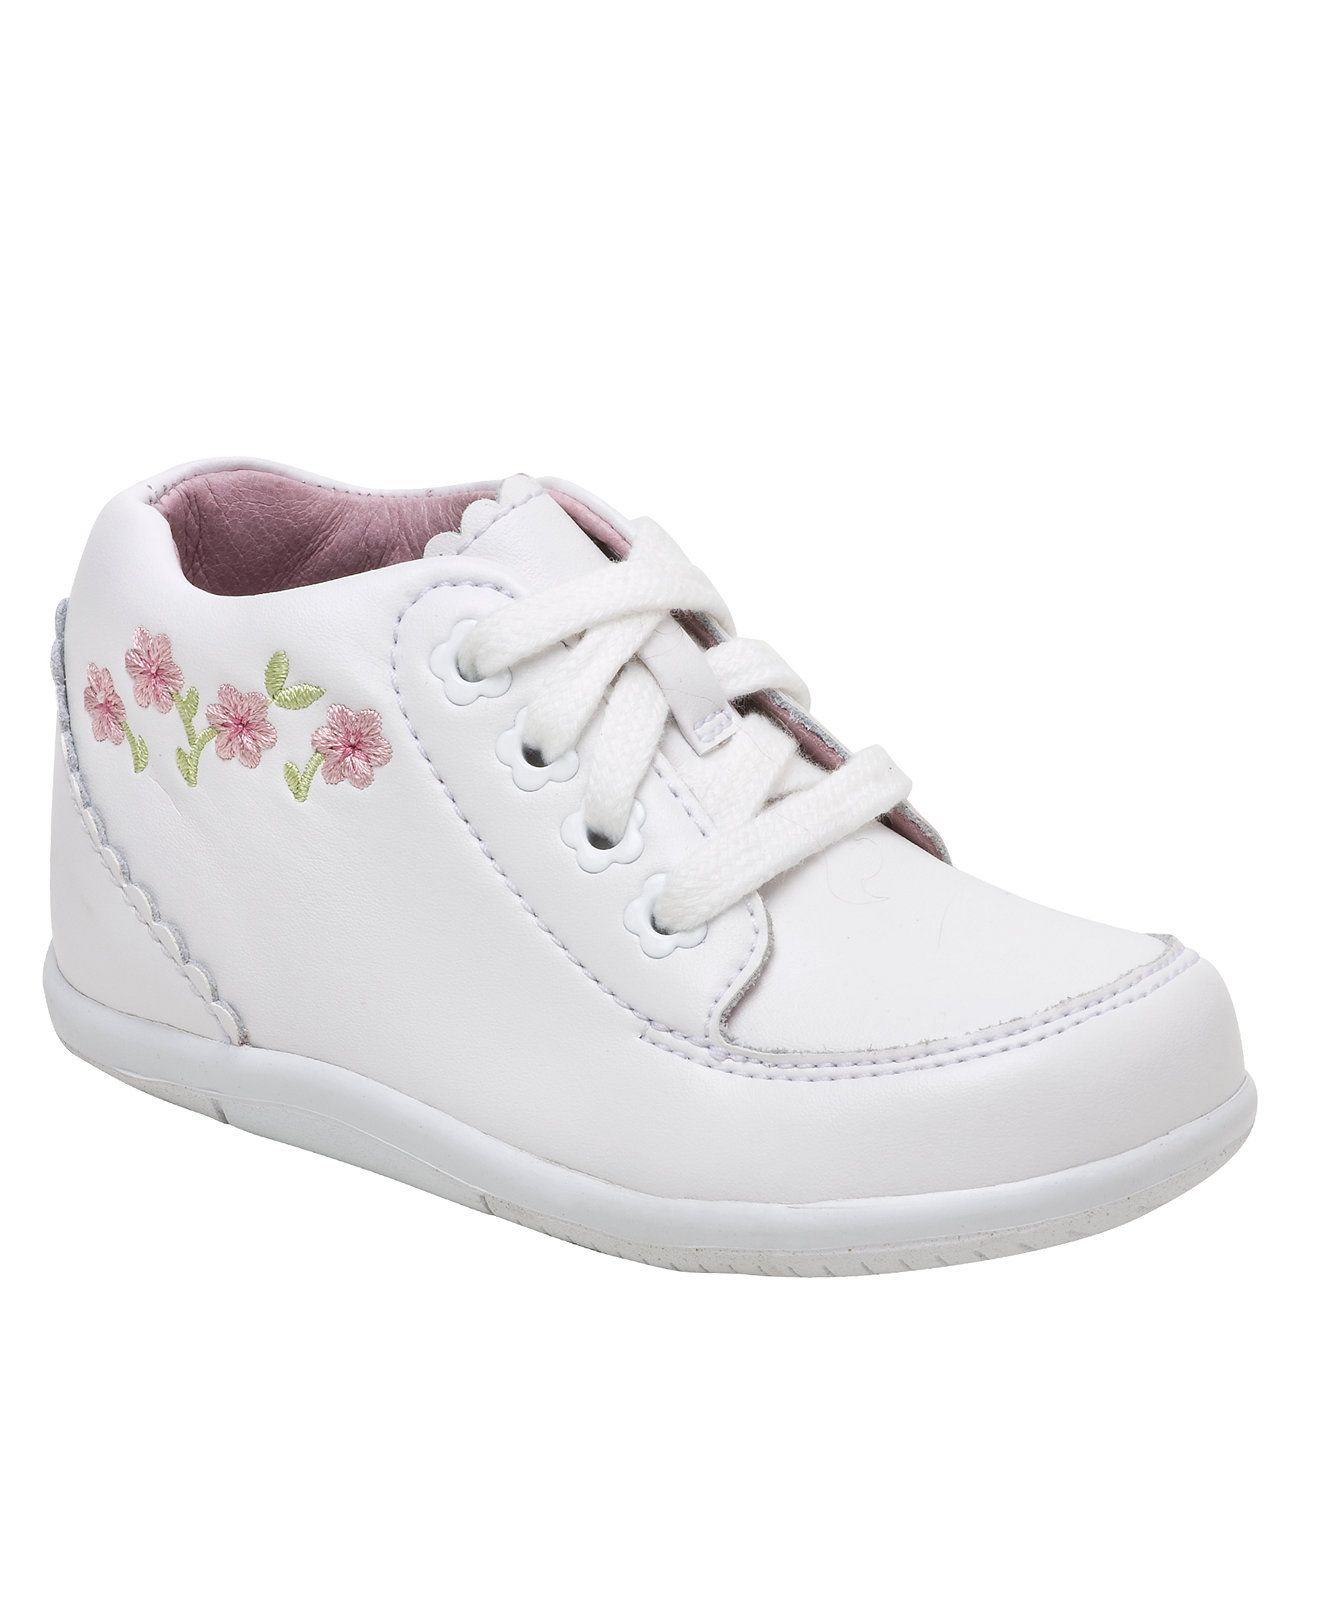 Stride Rite SRT Emilia Shoes, Baby Girl